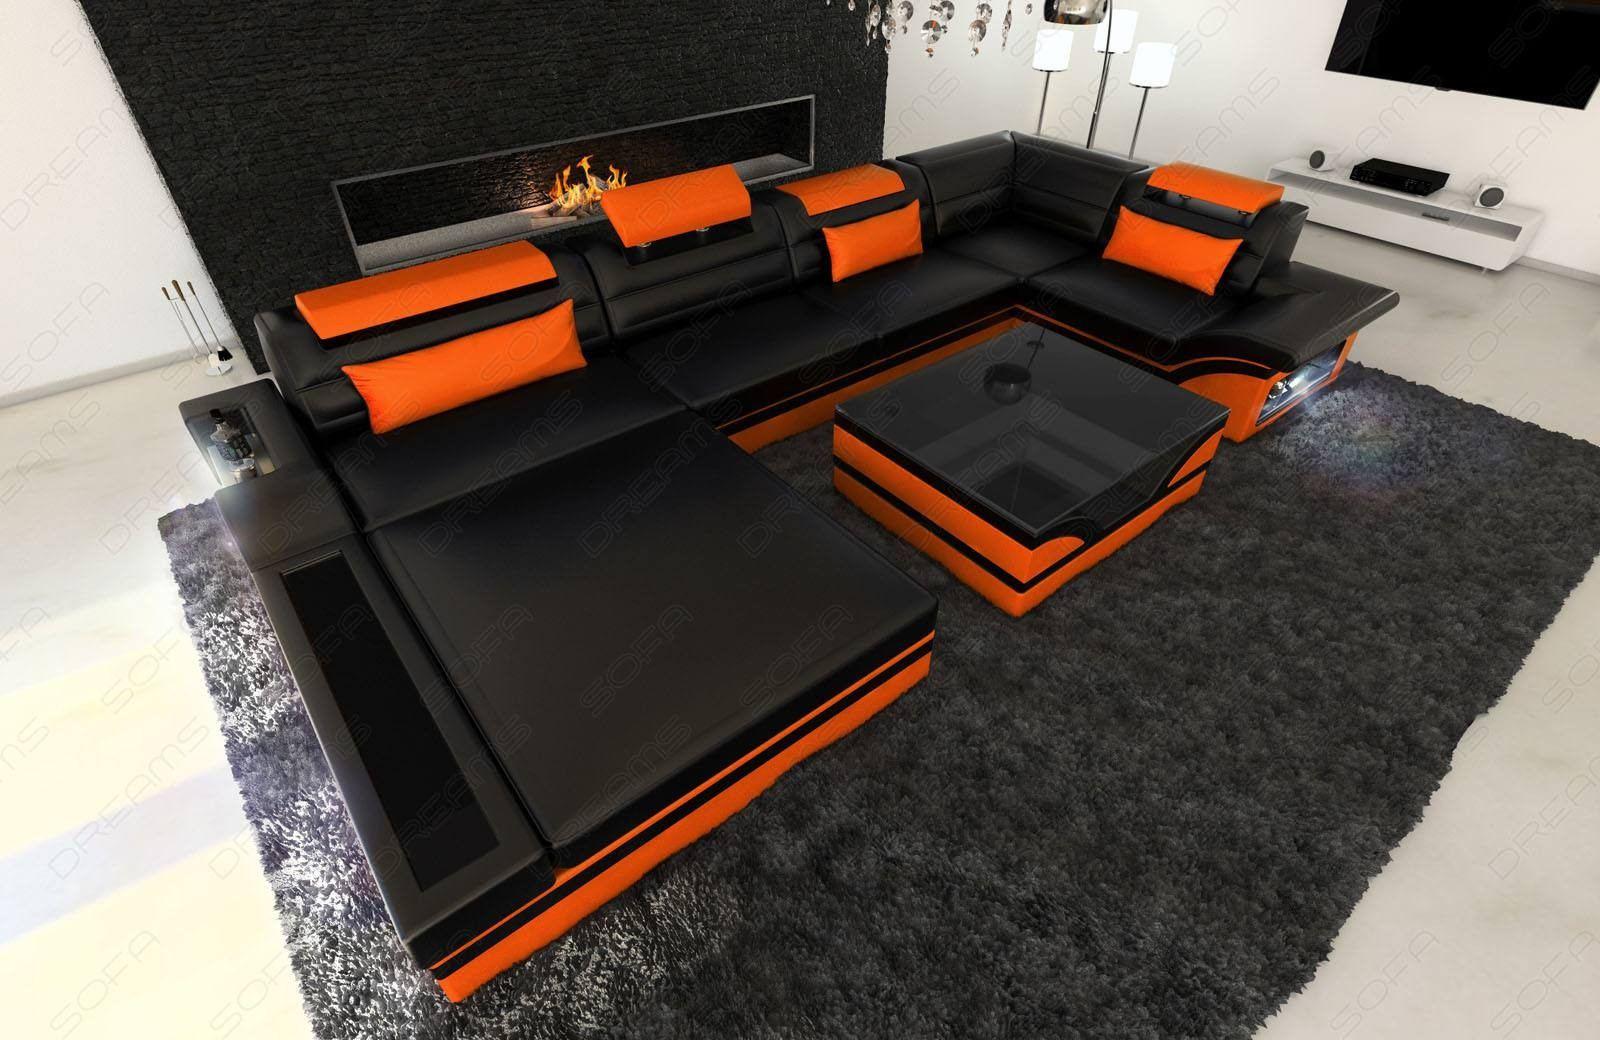 Terrific Design Leather Sofa Orlando With Led Lights Ibusinesslaw Wood Chair Design Ideas Ibusinesslaworg